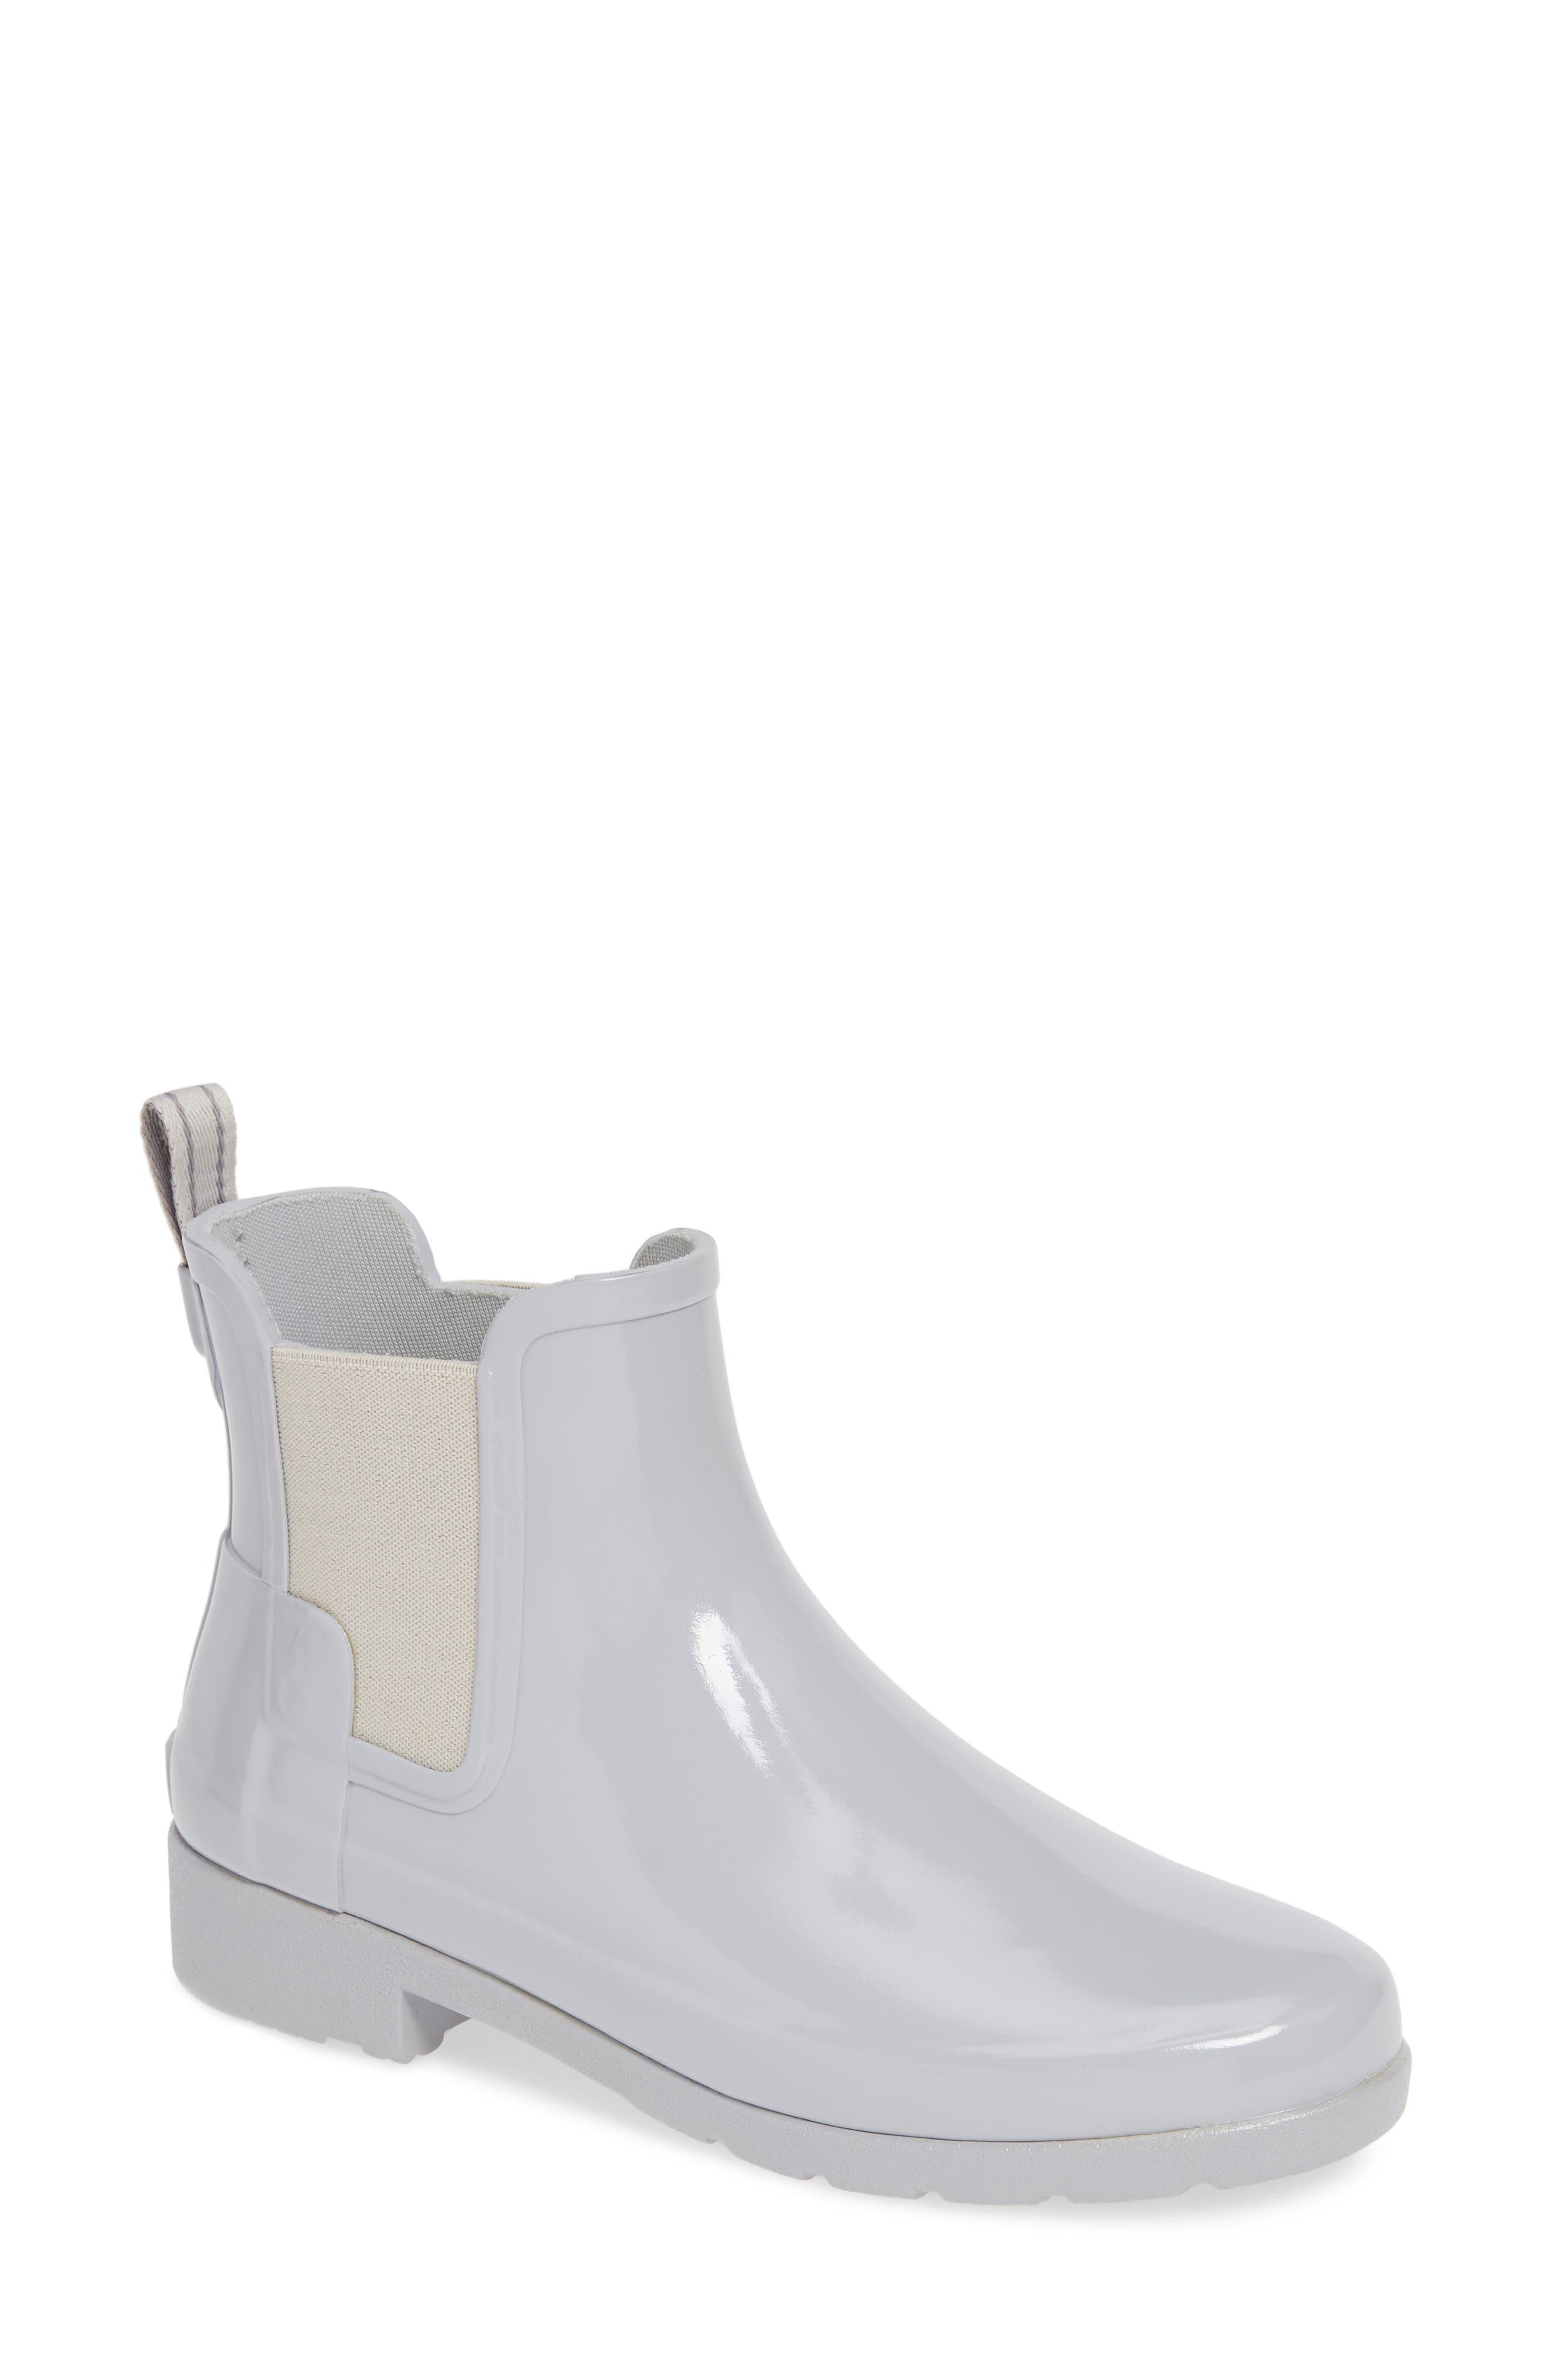 HUNTER, Original Refined Chelsea Waterproof Rain Boot, Main thumbnail 1, color, 074